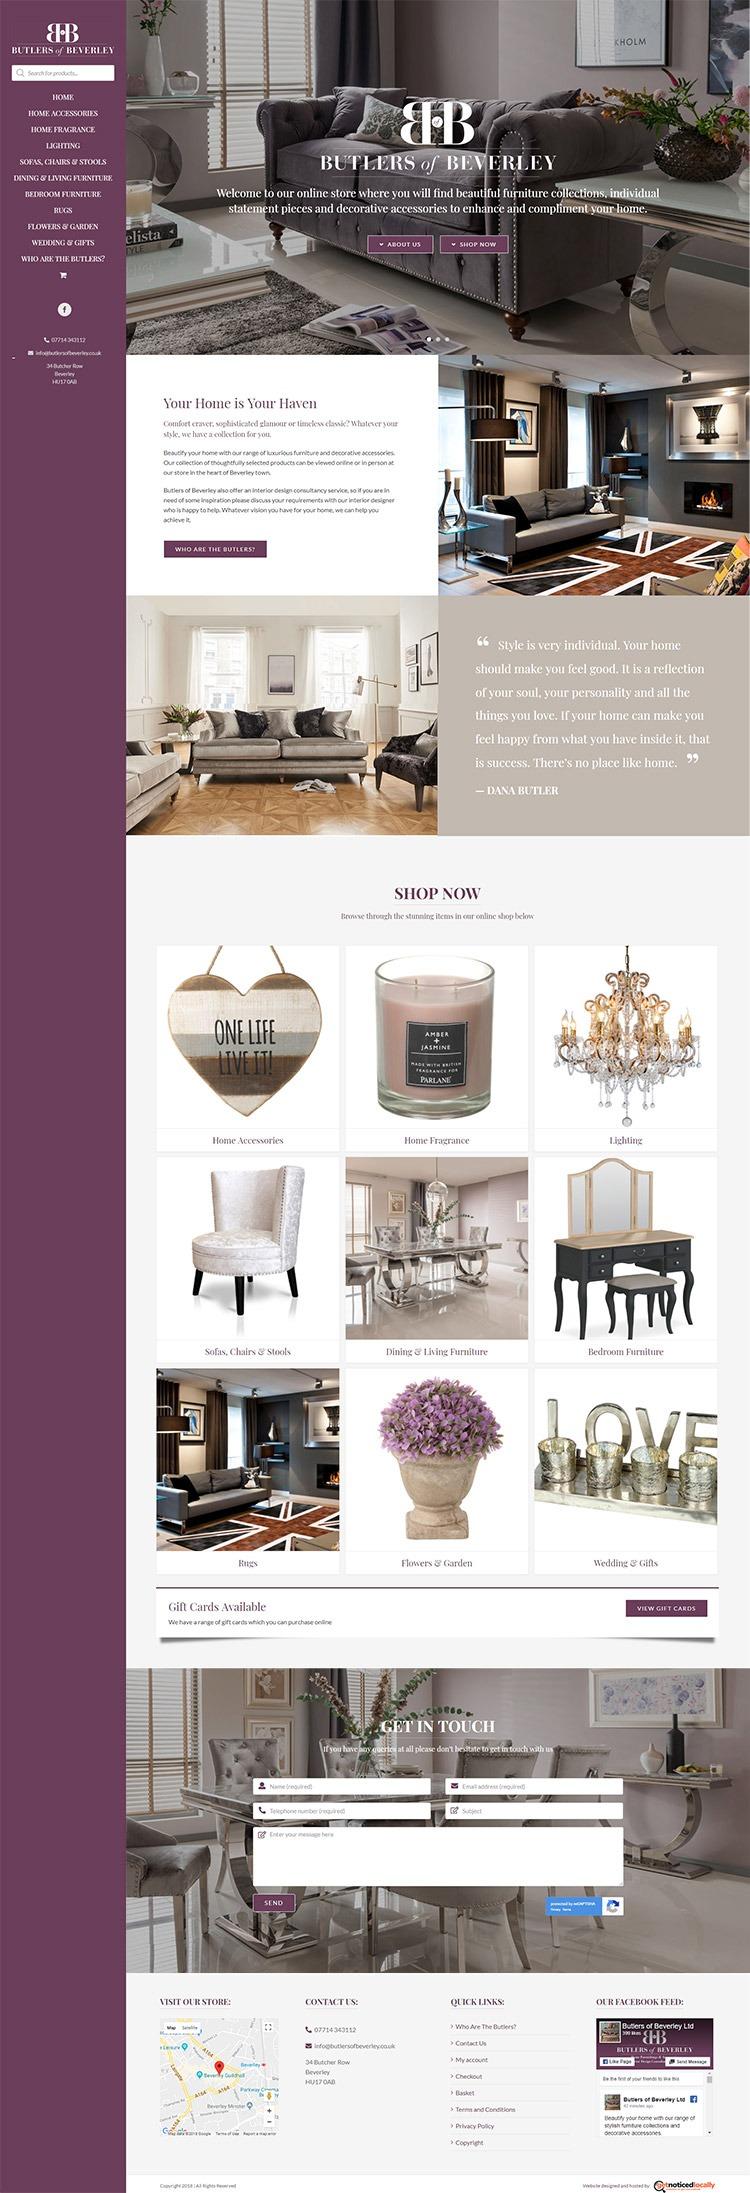 Butlers of Beverley website layout